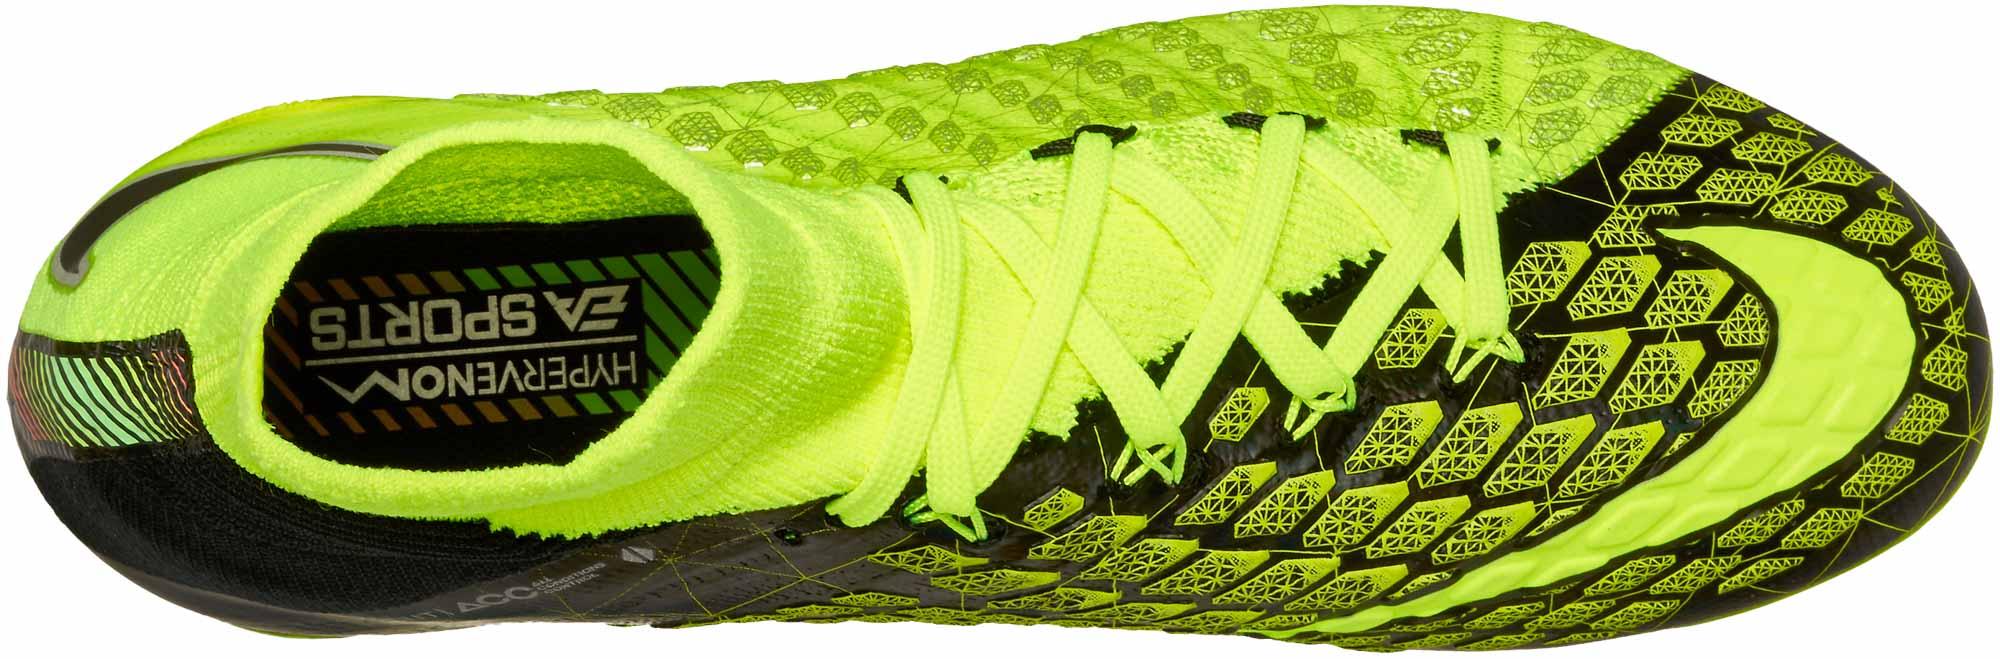 hot sale online dcea2 5cb9e Nike Kids Hypervenom Phantom III DF FG - EA Sports - Volt ...